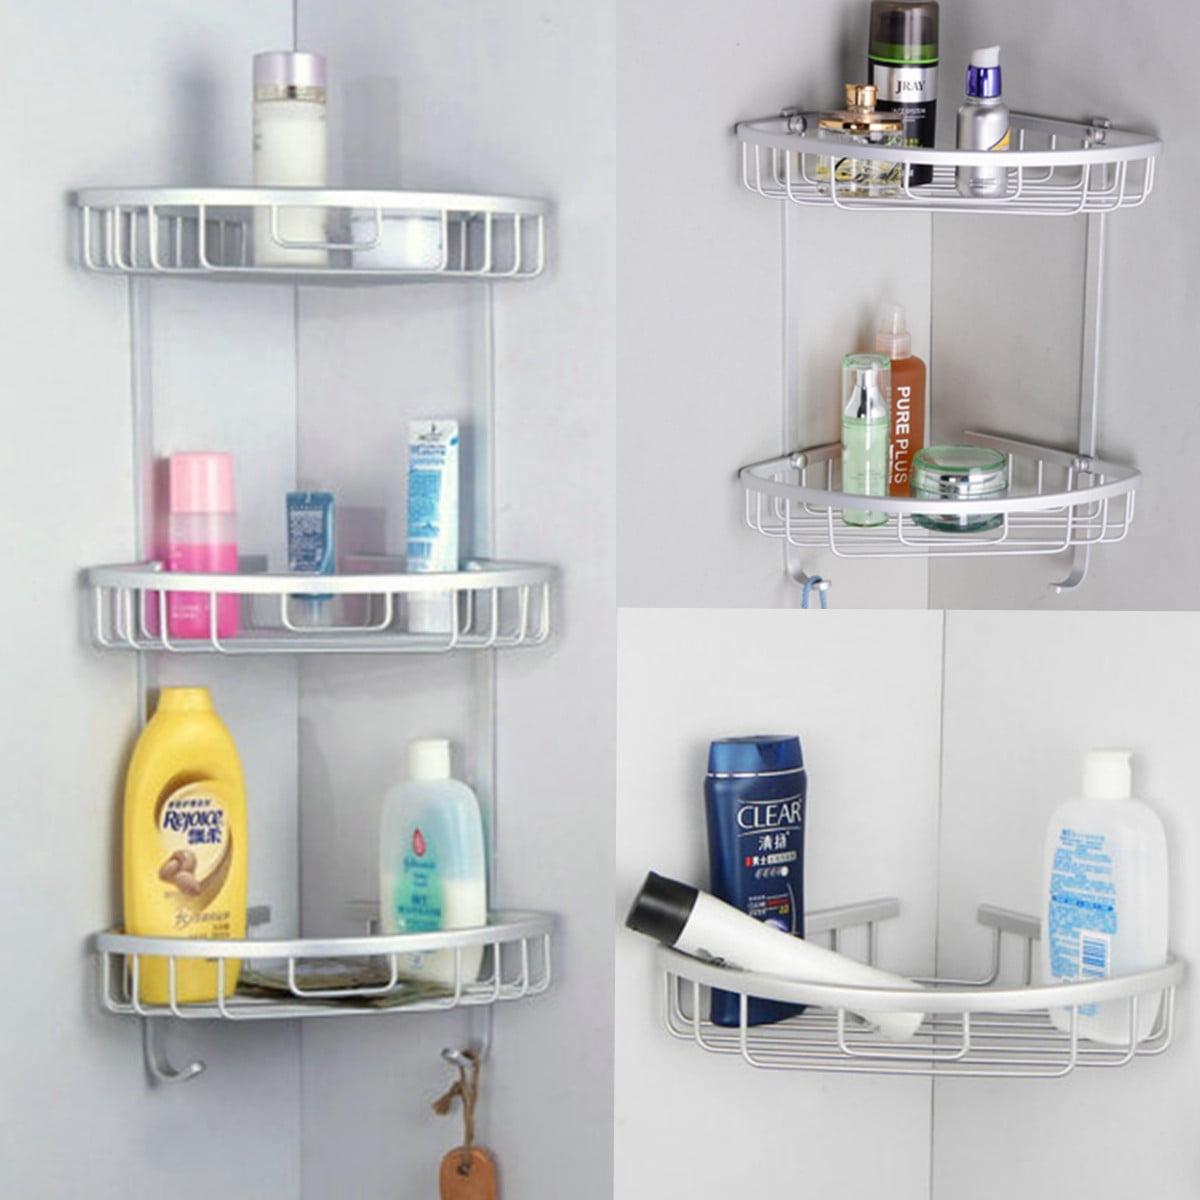 Meigar Triangular Shower Caddy 3 Layers Aluminum Bathroom Corner Rack Wall Shelves Storage Organizer Holder